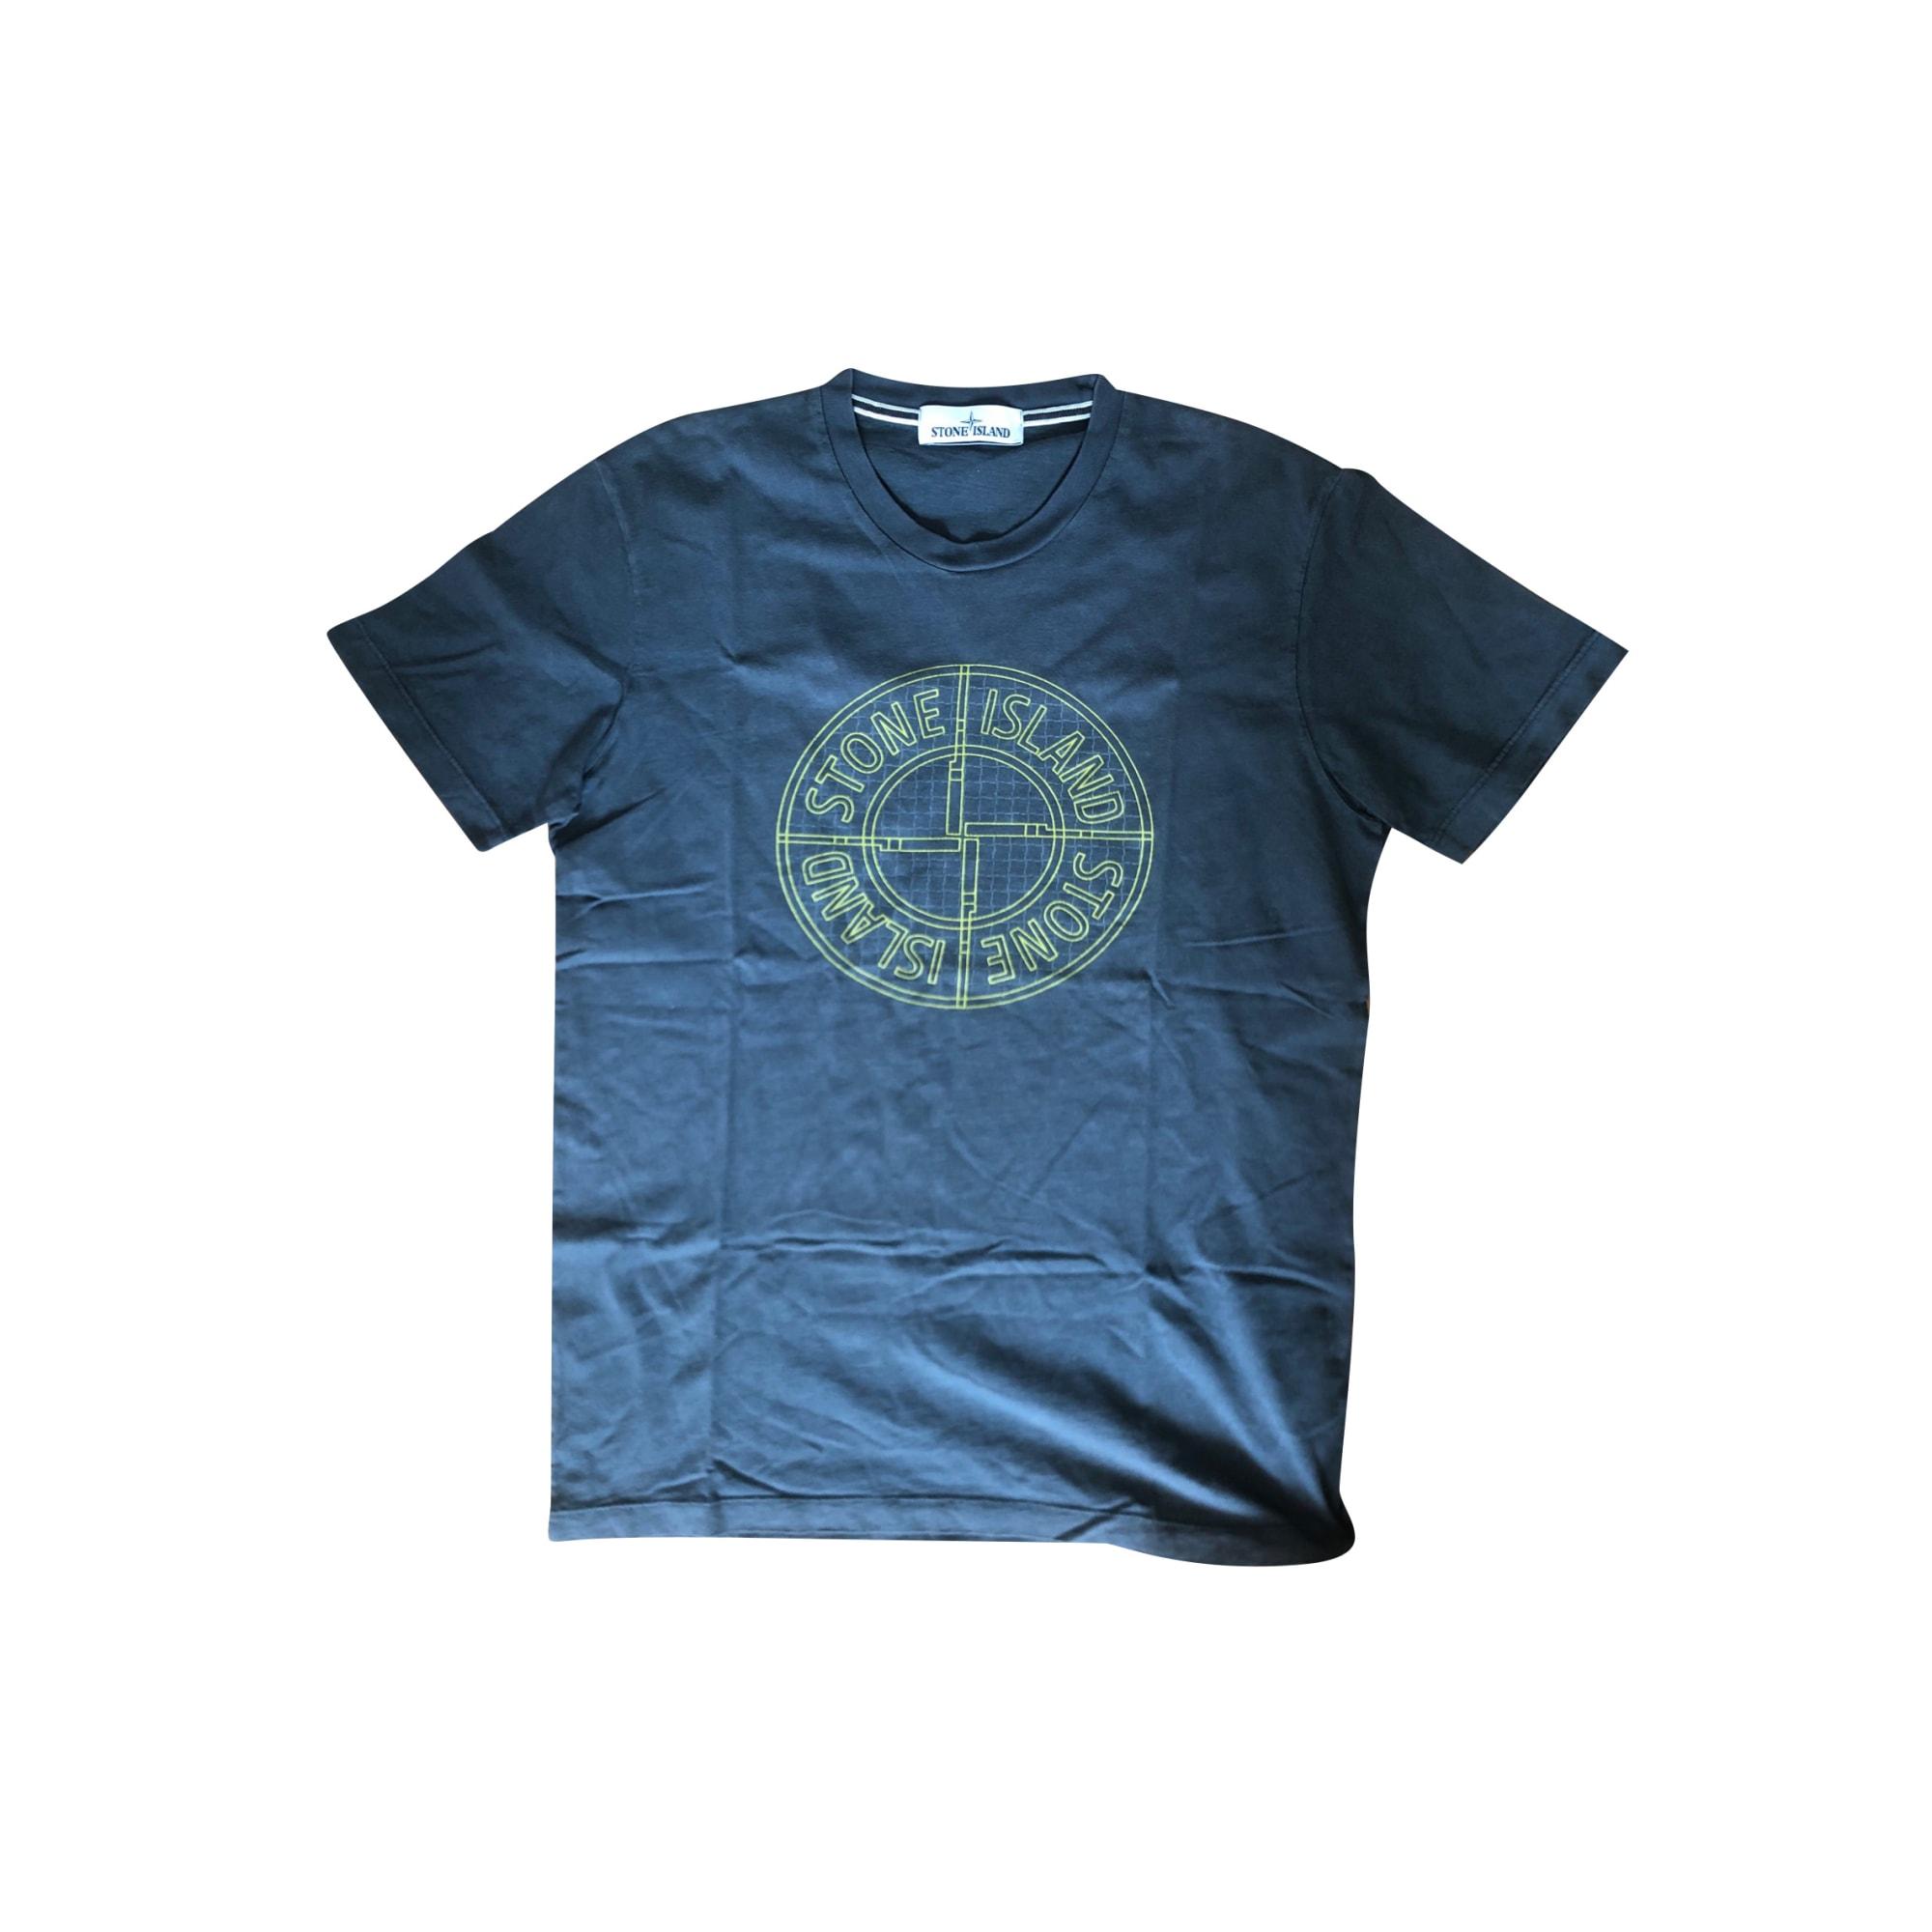 T-shirt STONE ISLAND Khaki